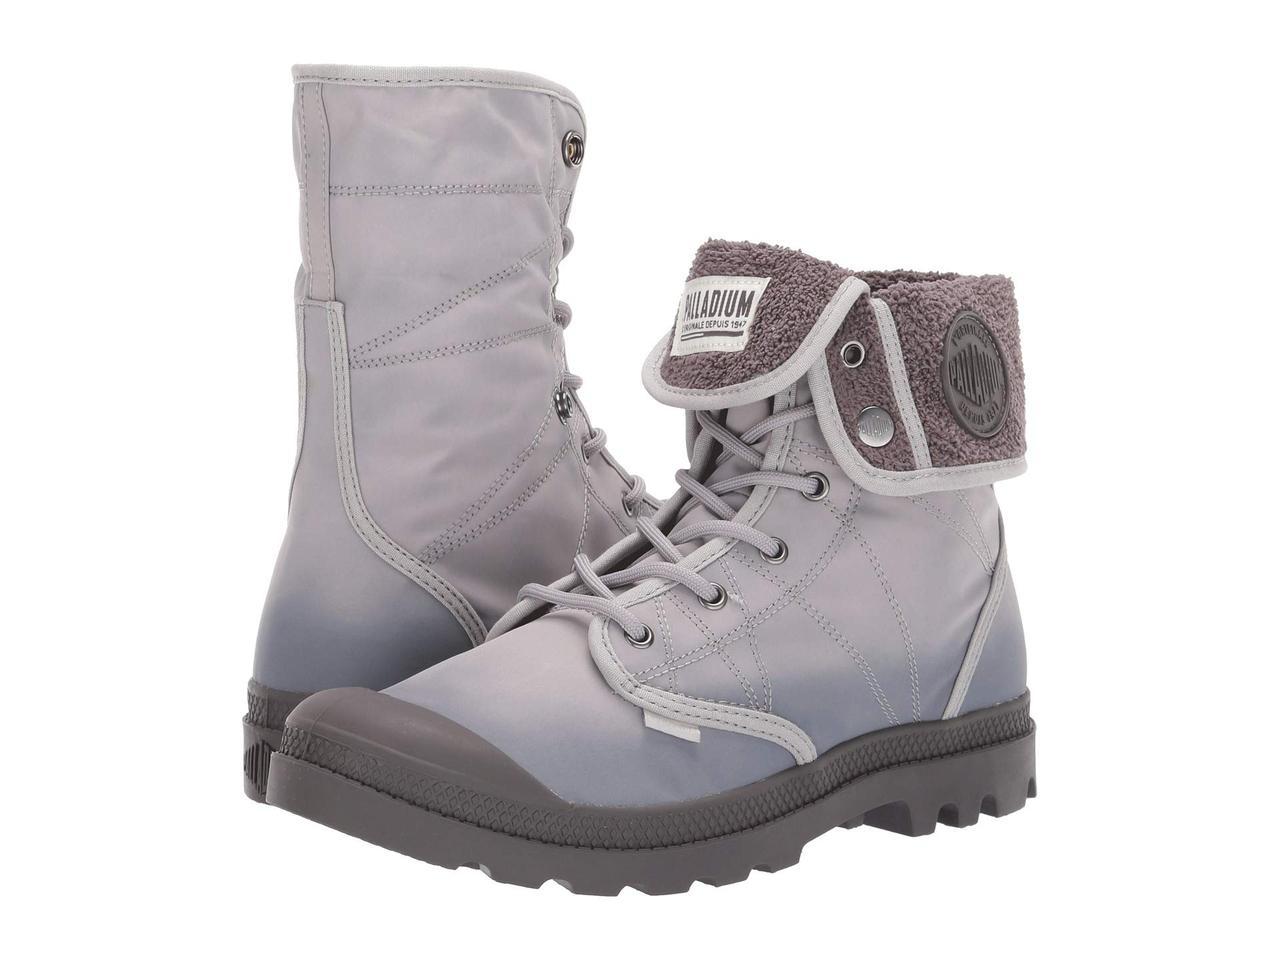 Ботинки Сапоги (Оригинал) Palladium Pallabrousse Baggy TX Ash Dark Gull Grey c815127c2e4dc